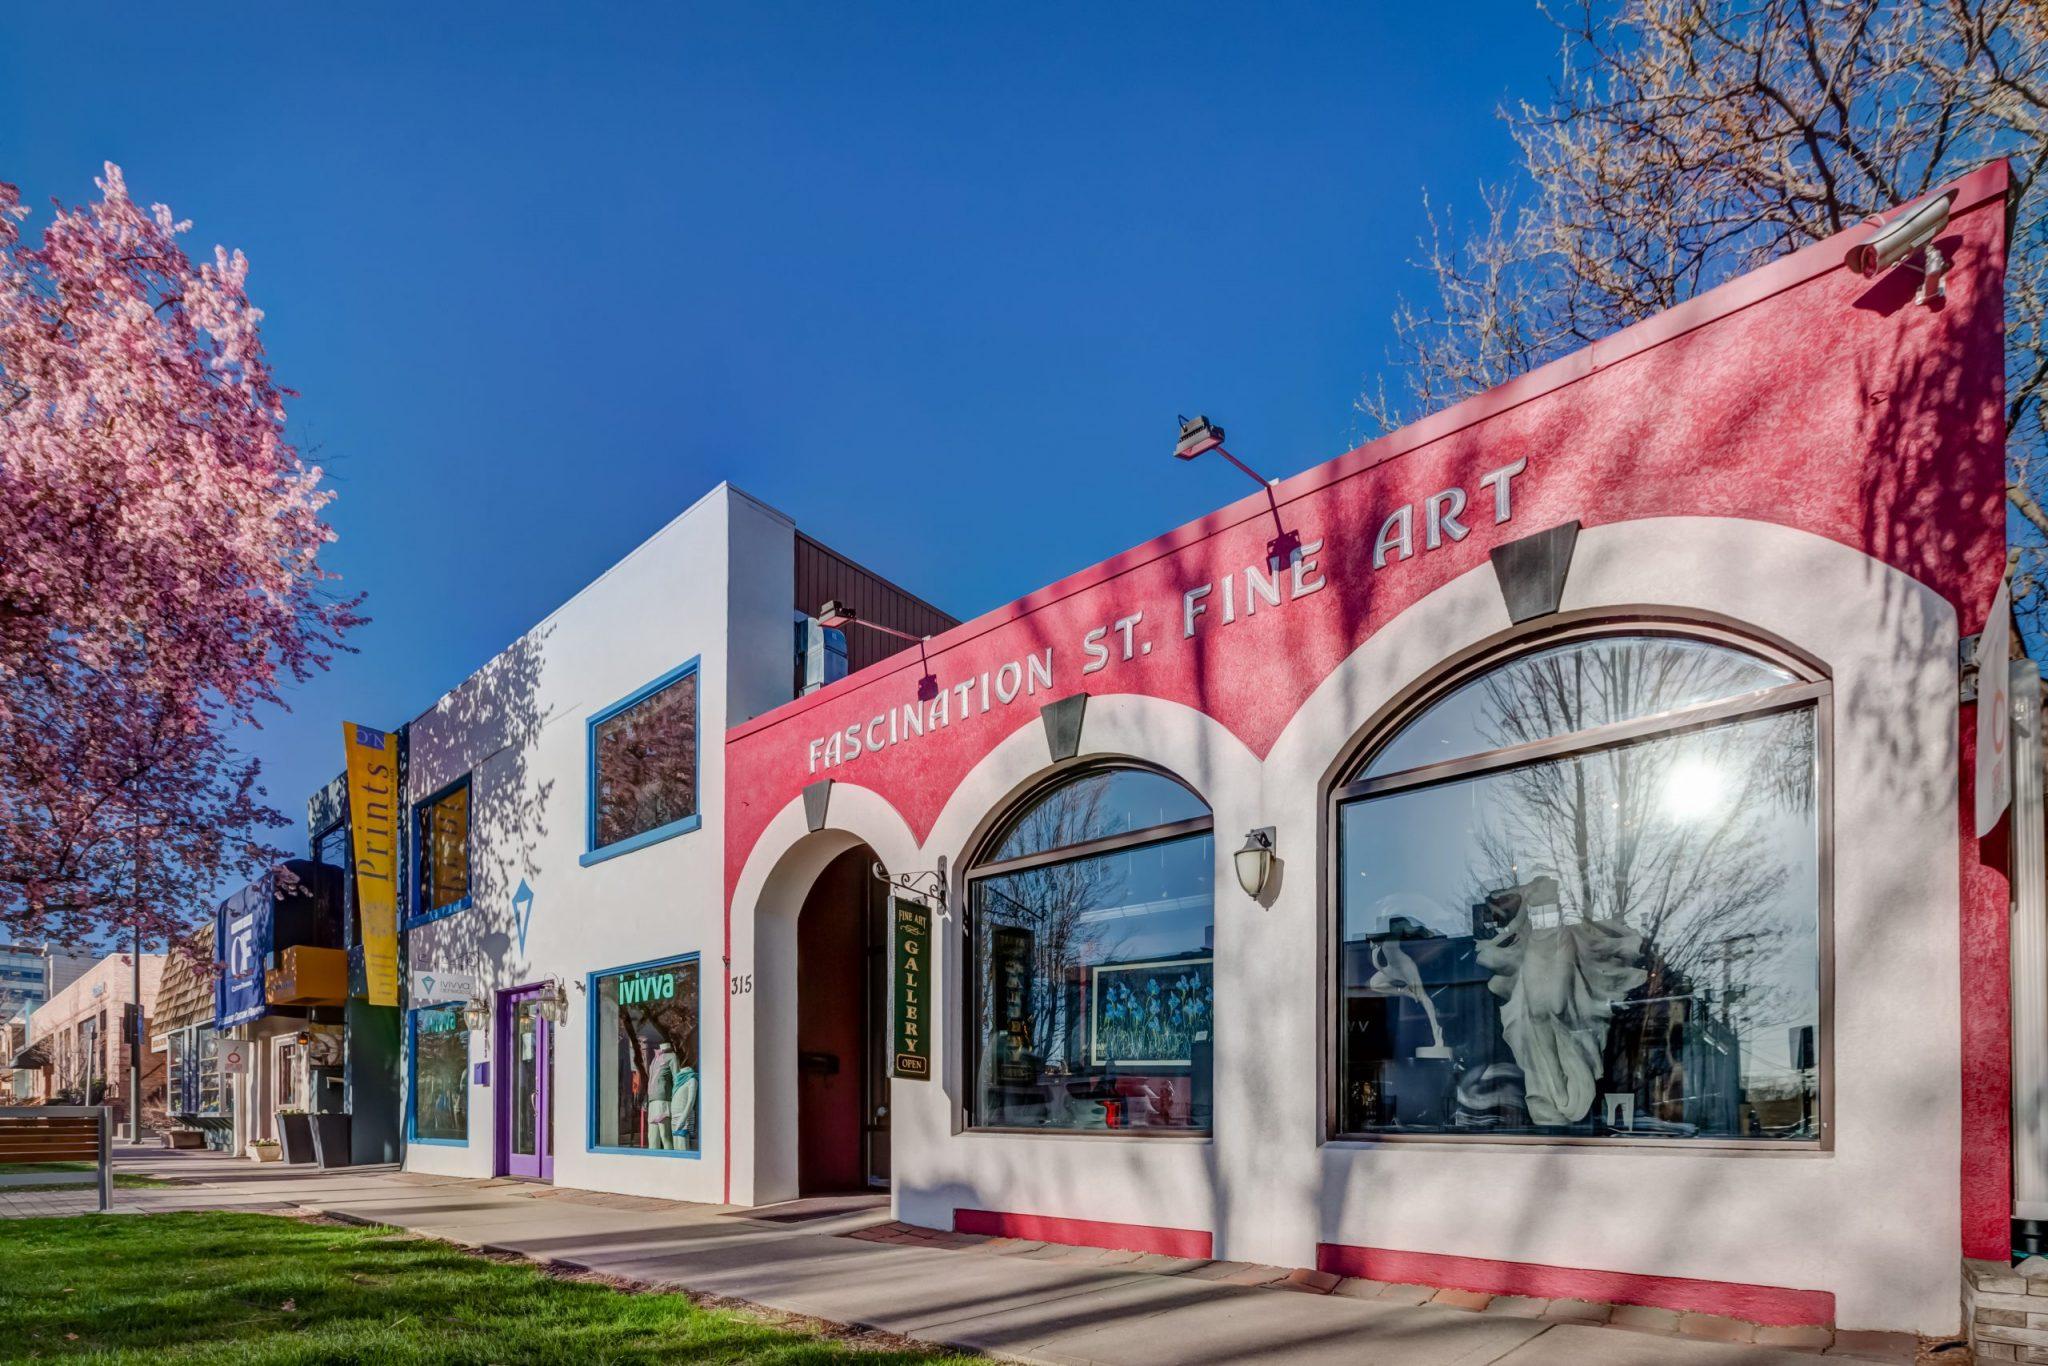 Fascination Street Fine Art Aaron LaPedis Owner Interview Cherry Creek Magazine Cherry Creek North Denver Colorado Art Gallery